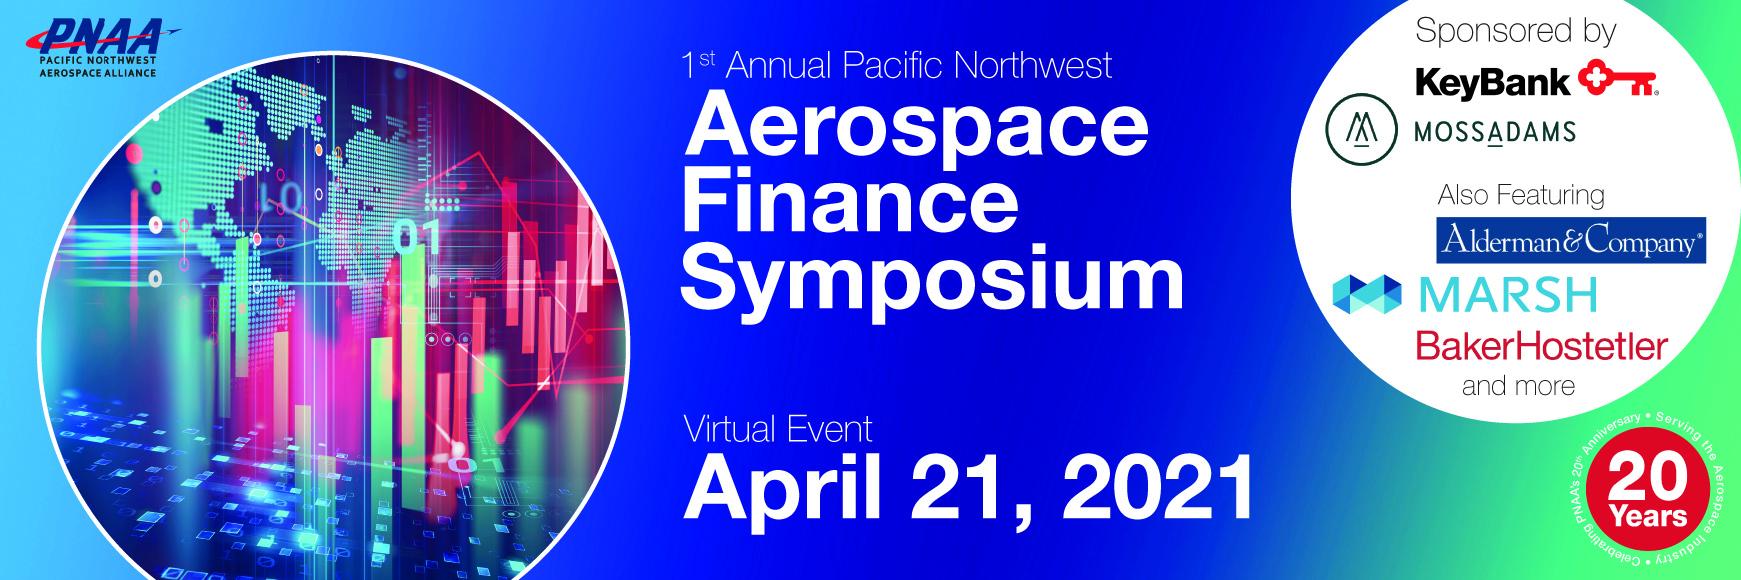 2021_Aerospace_Finance_Symposium_Header